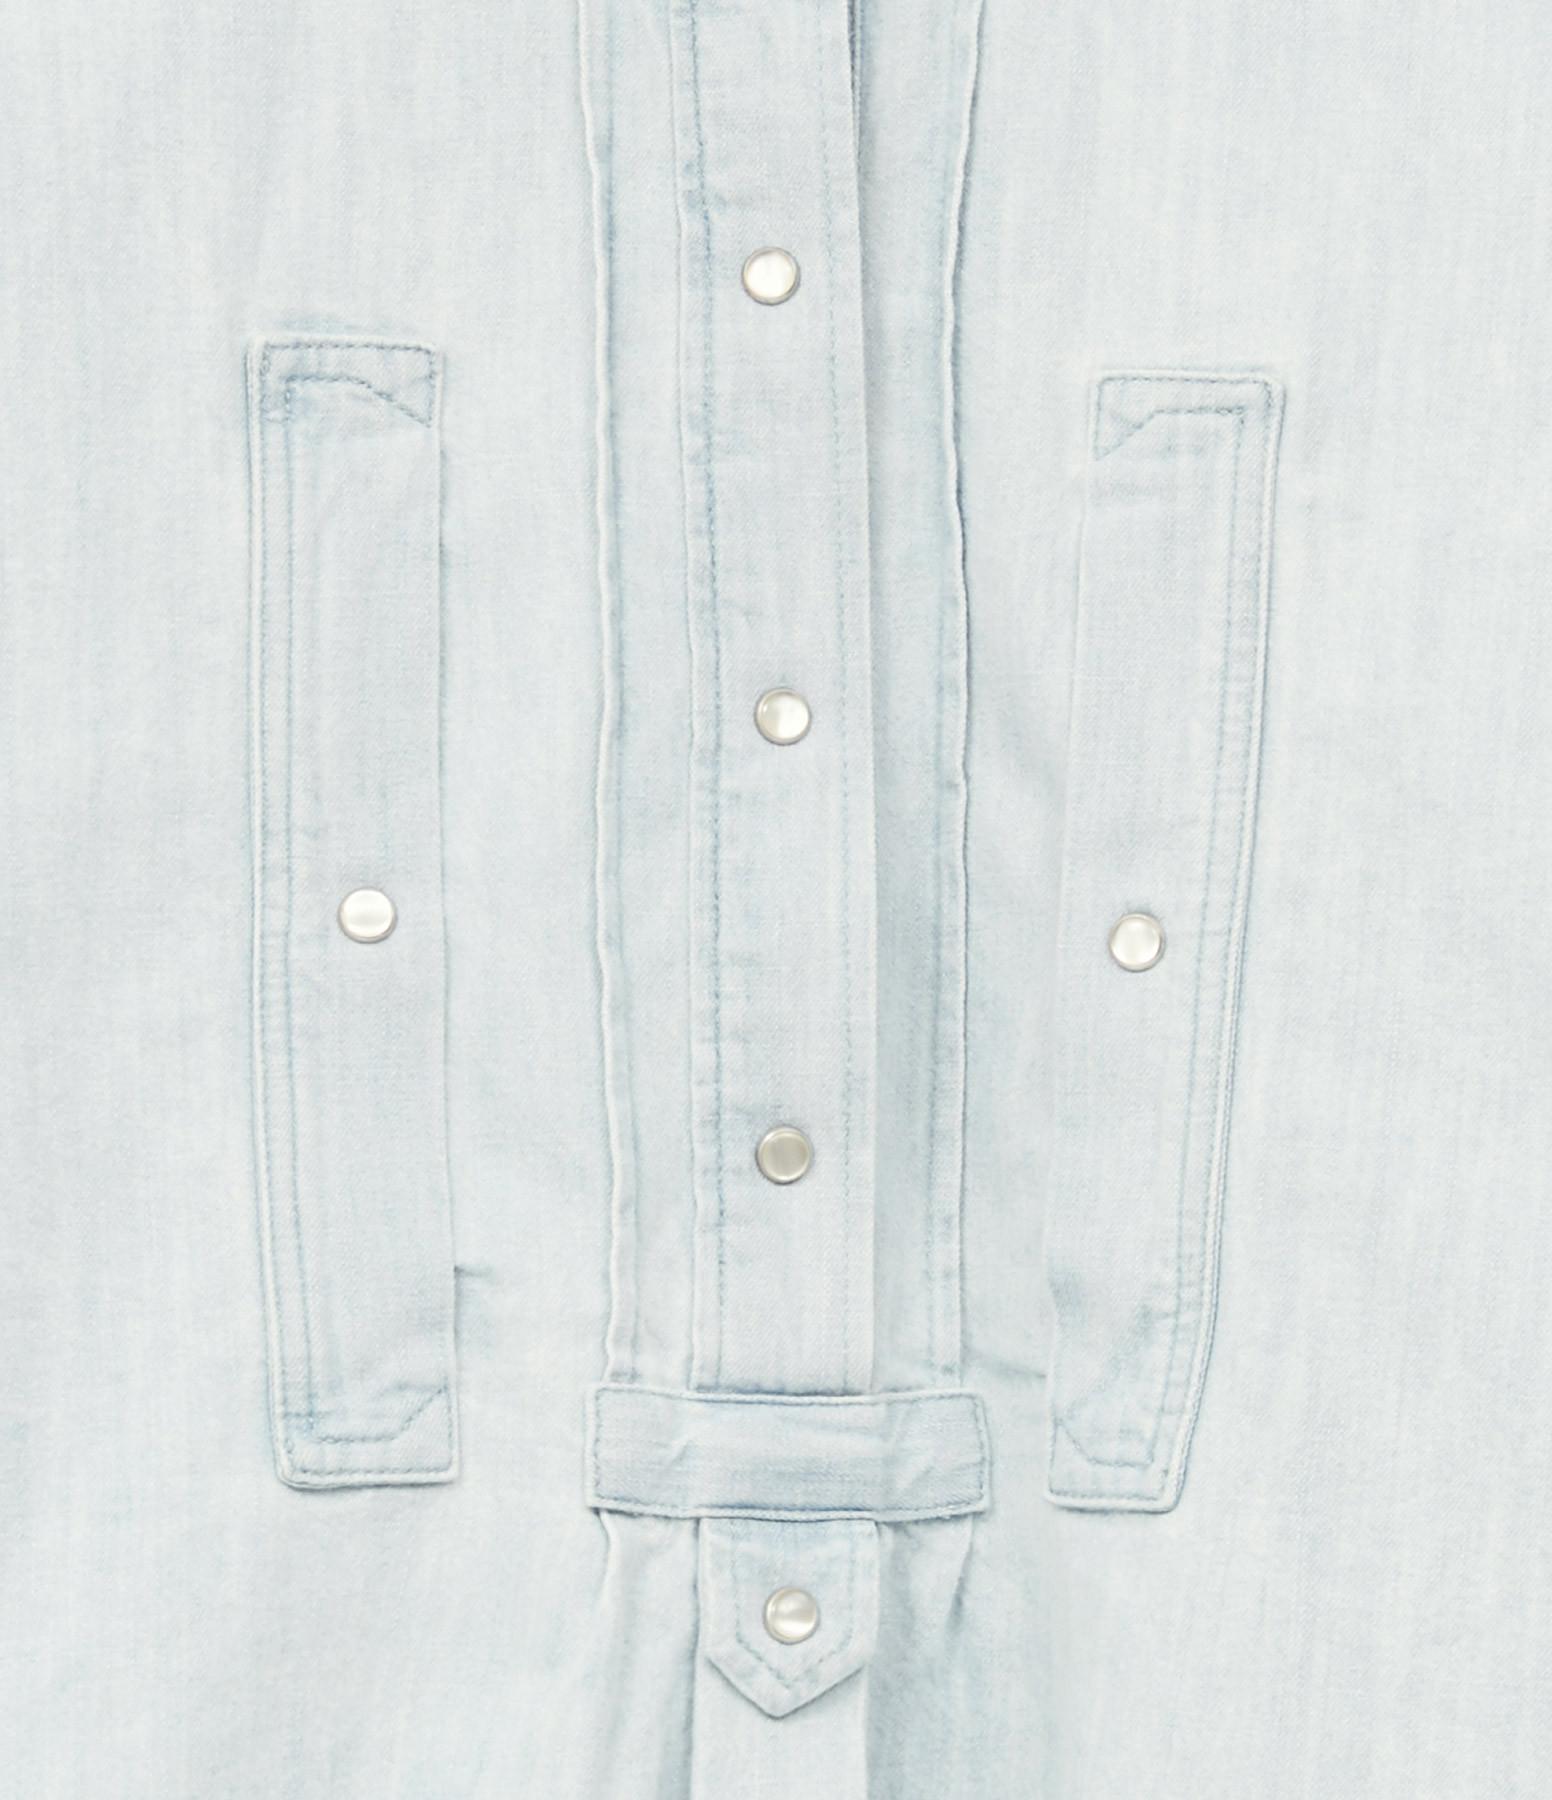 ISABEL MARANT ÉTOILE - Chemise Madoc Denim Bleu Clair